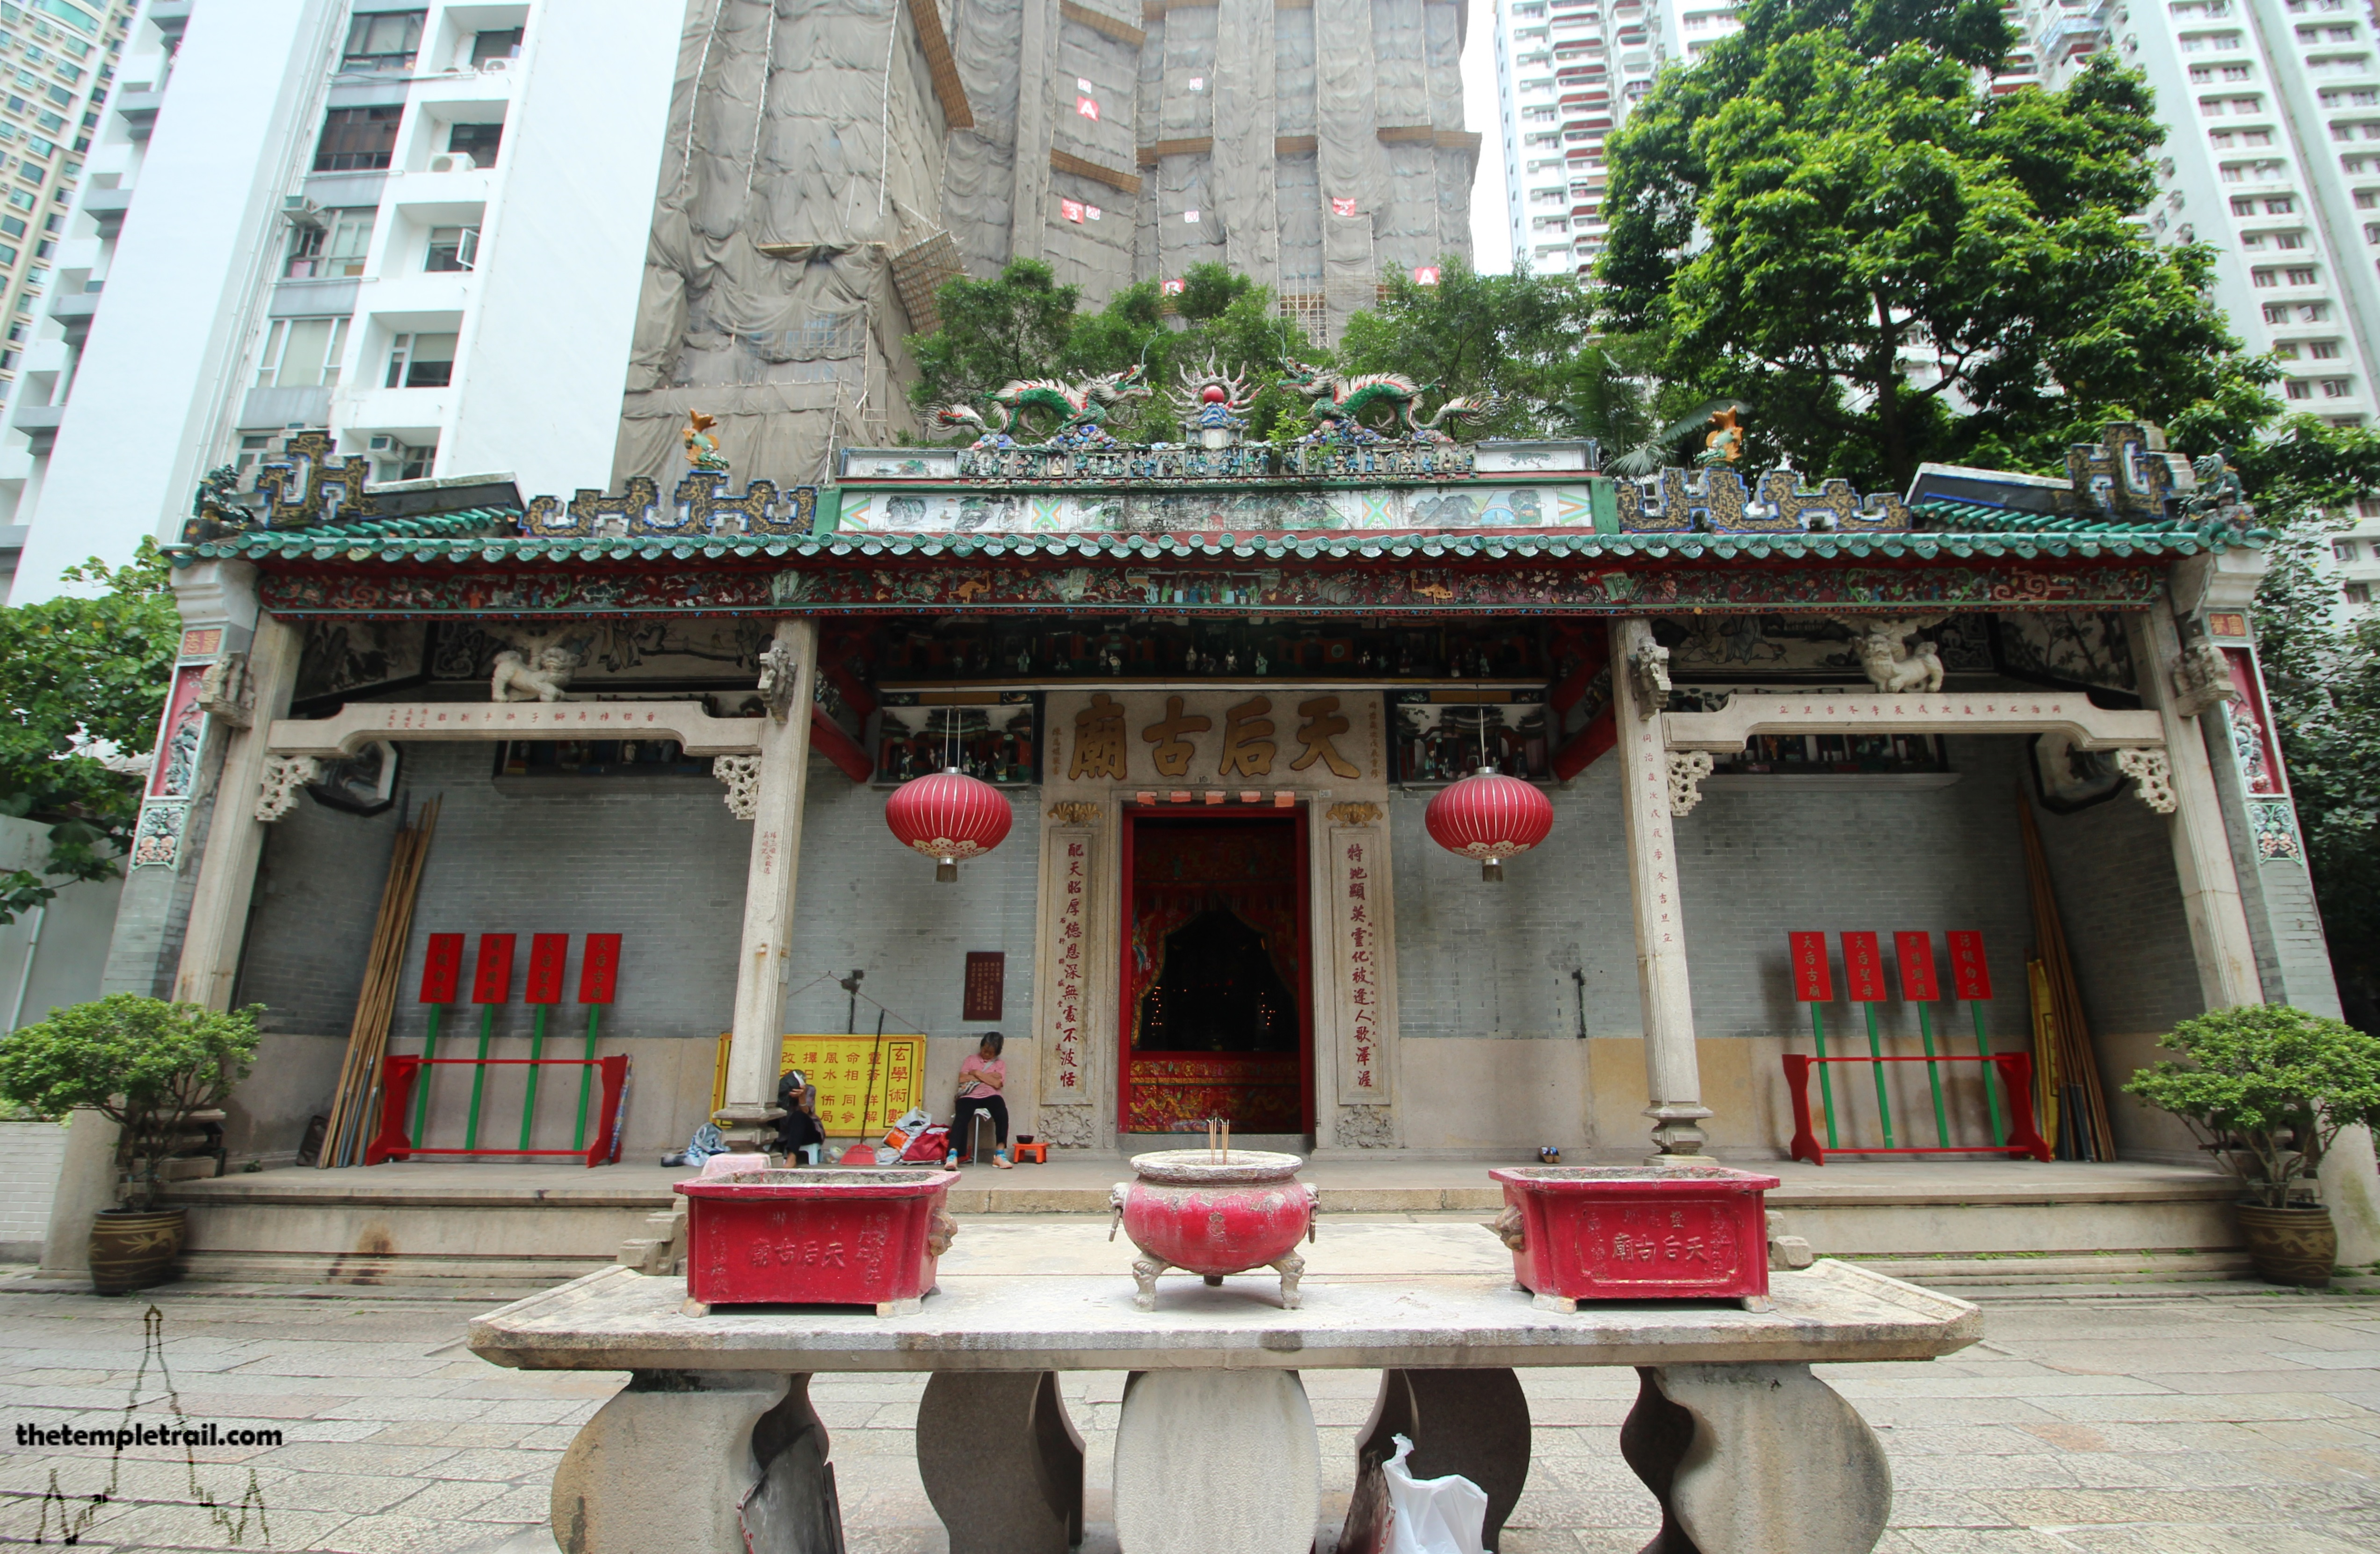 Tin Hau Temple, Causeway Bay